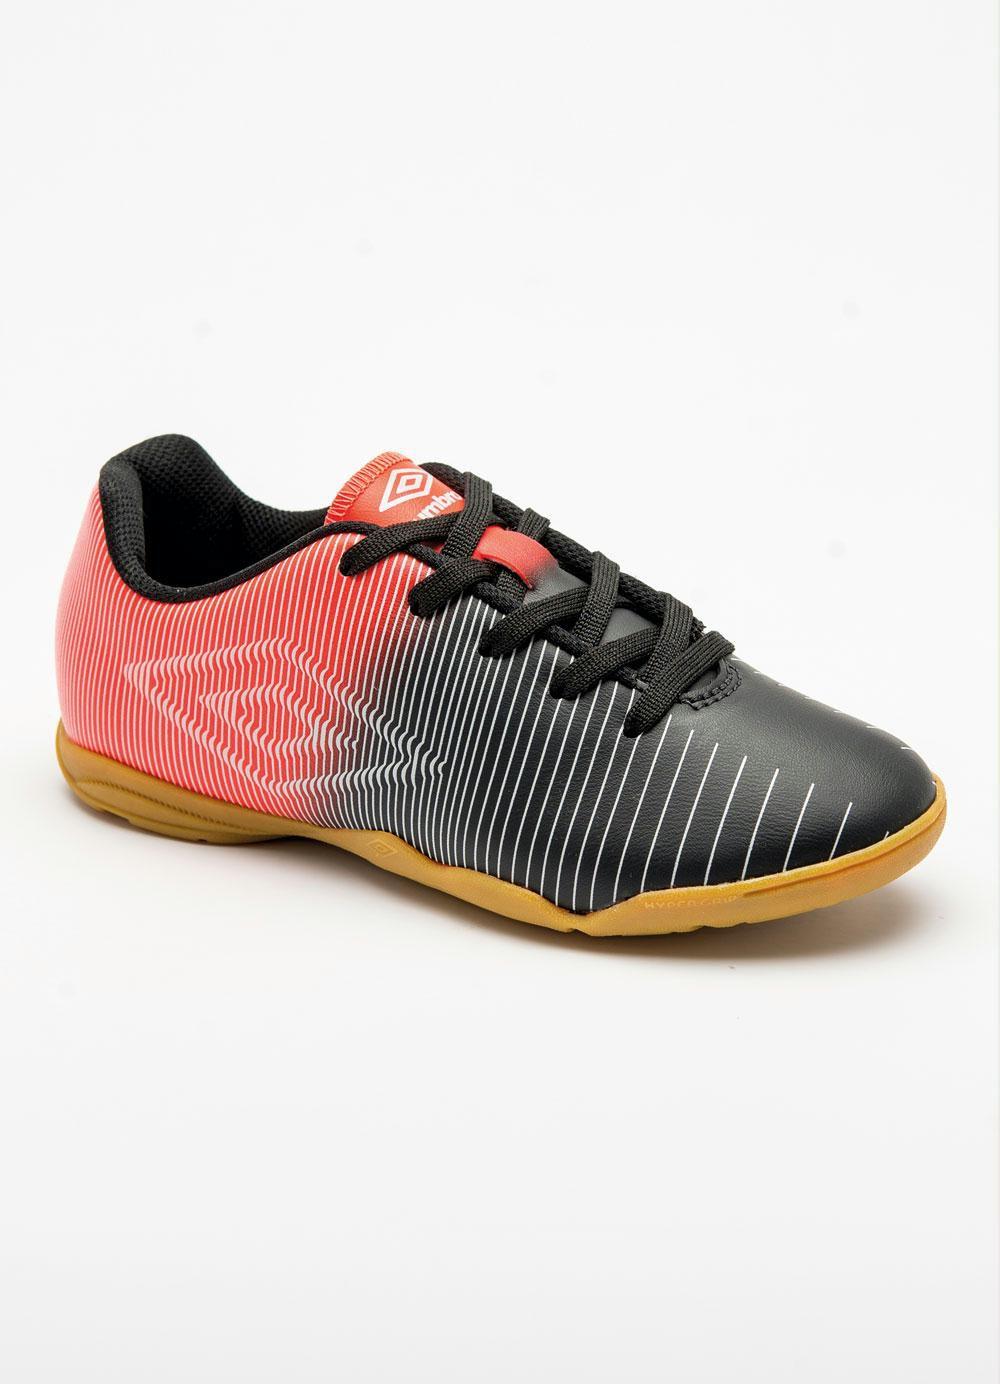 Chuteira Futsal Umbro Vibe Jr - Preto/Laranja